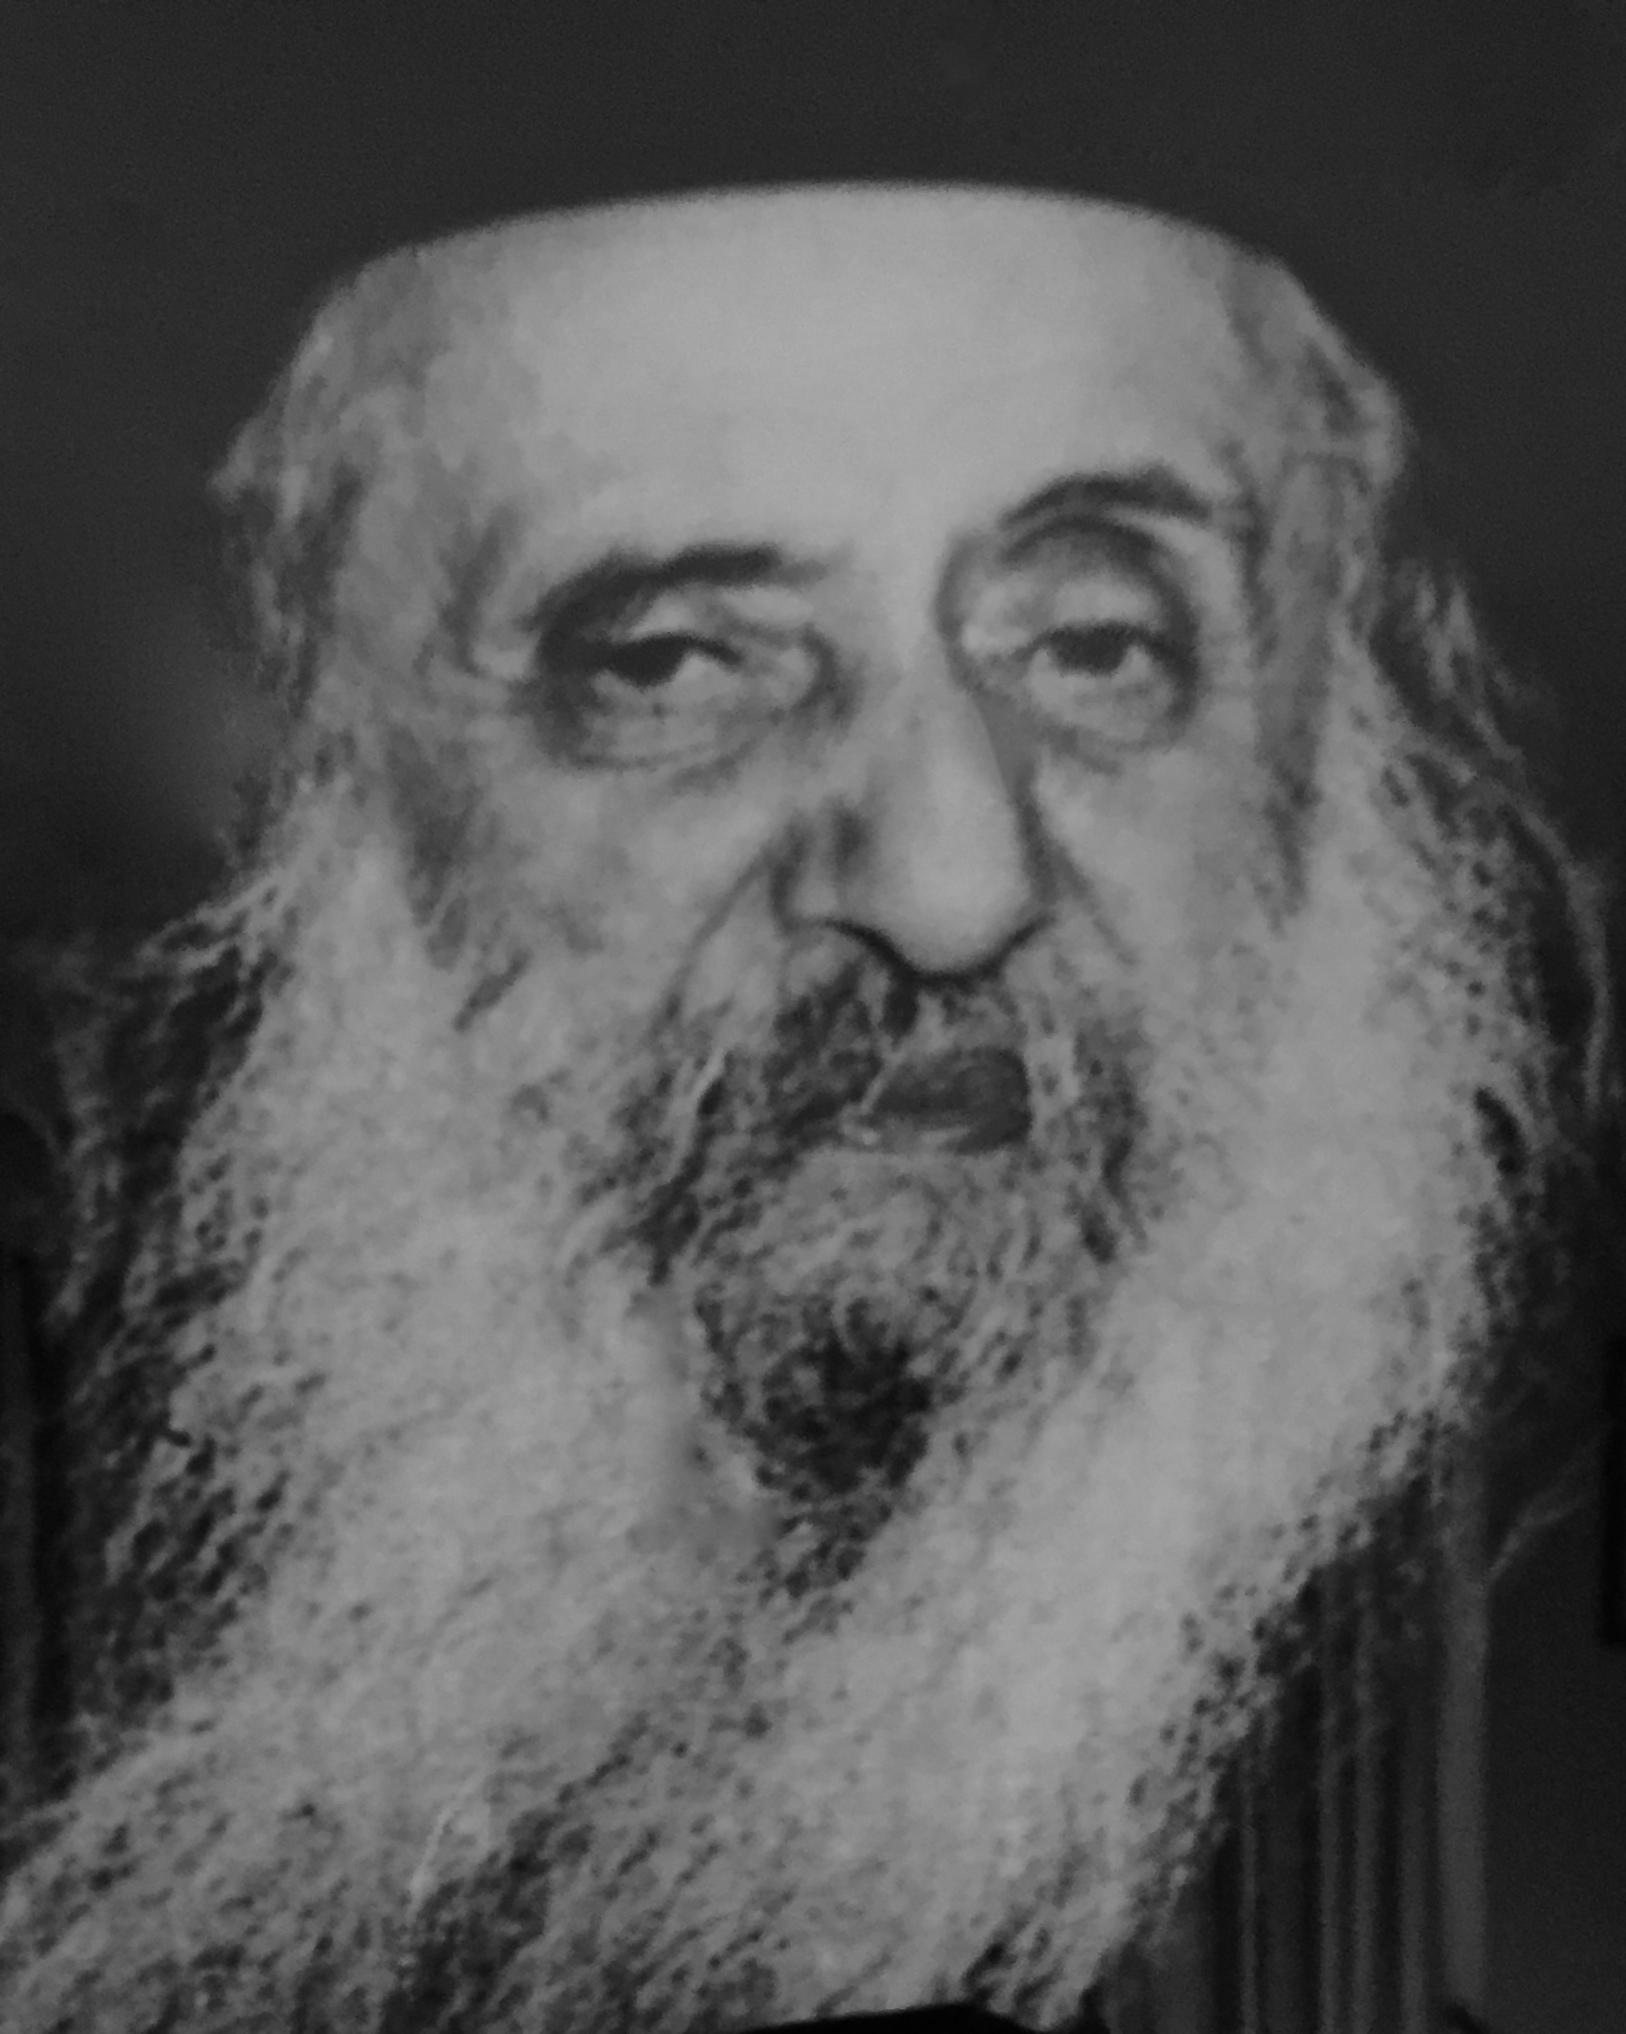 my footsteps echo the yemen journal of rabbi yaakov sapir